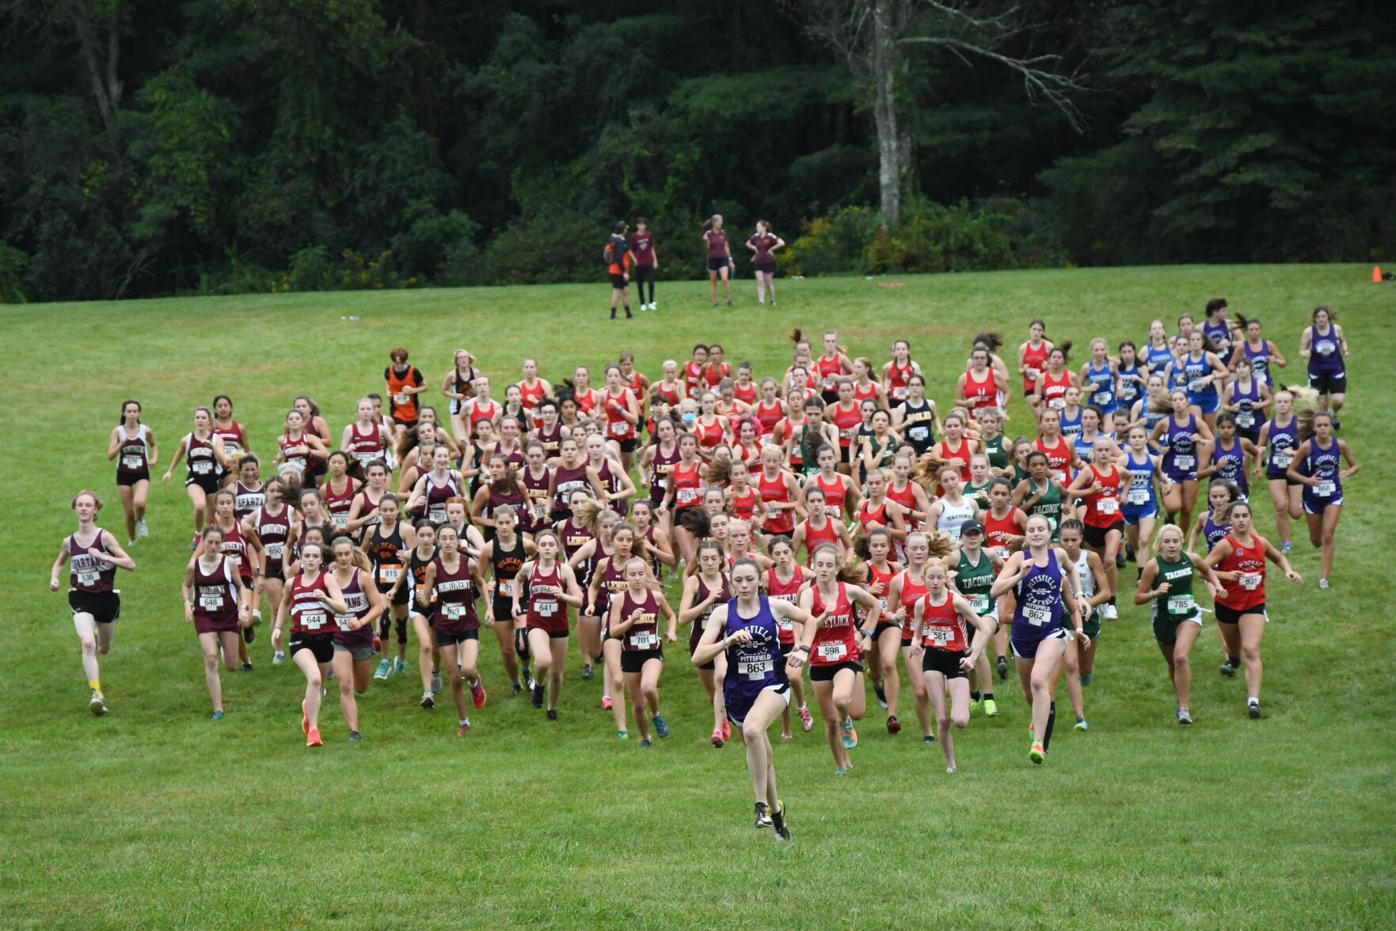 Start of the girls x-c race